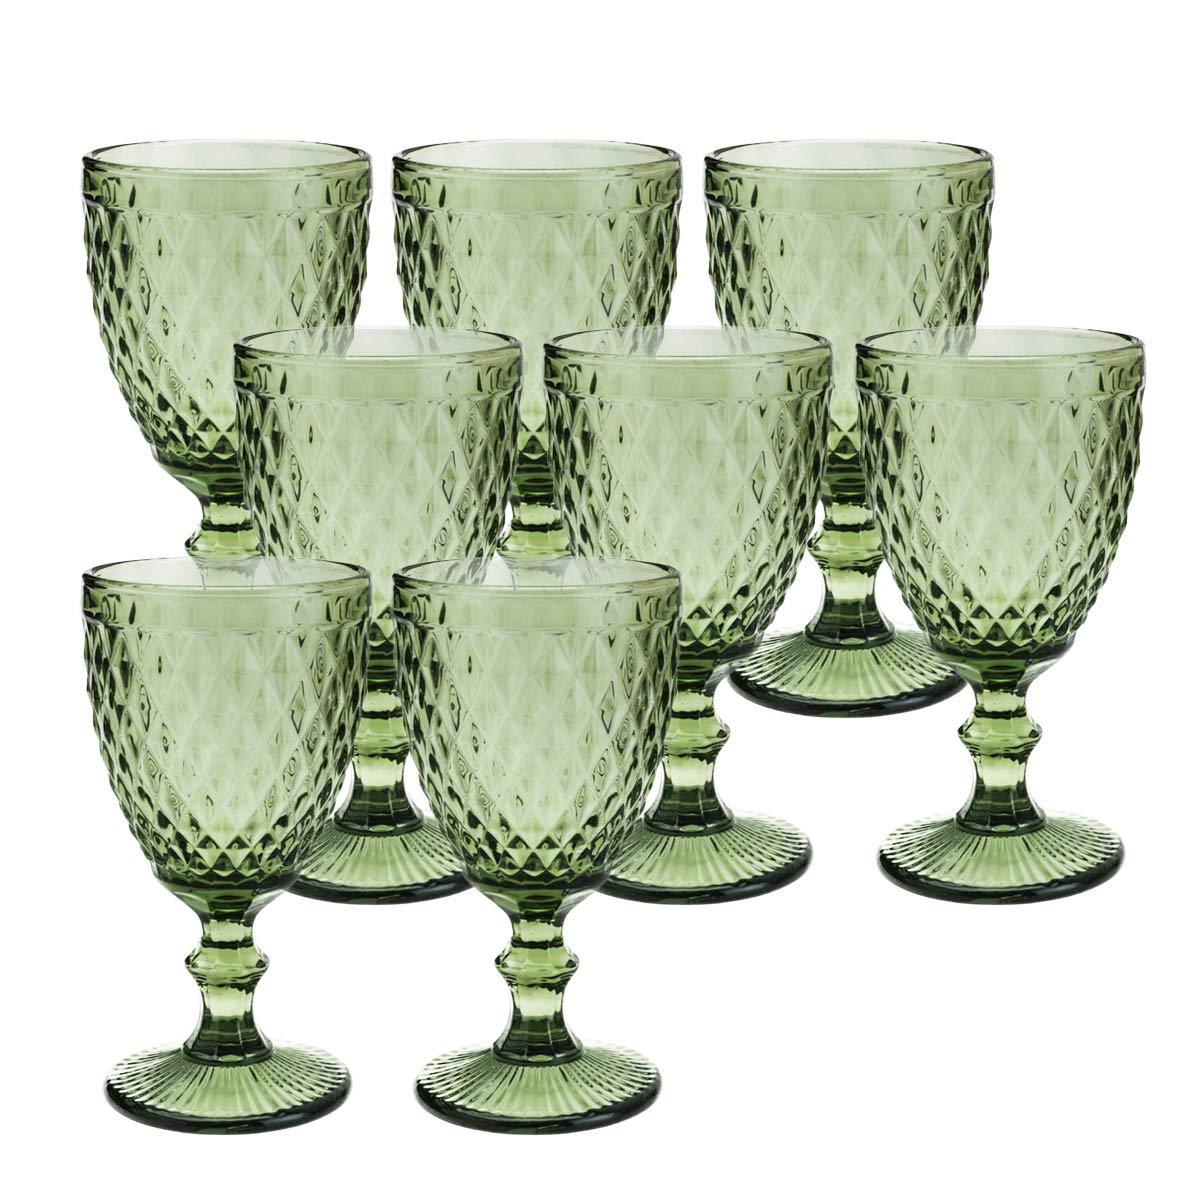 Jogo 8 Taças de Vidro p/Água Lyor Abacaxi 325 ml Verde  - Lemis